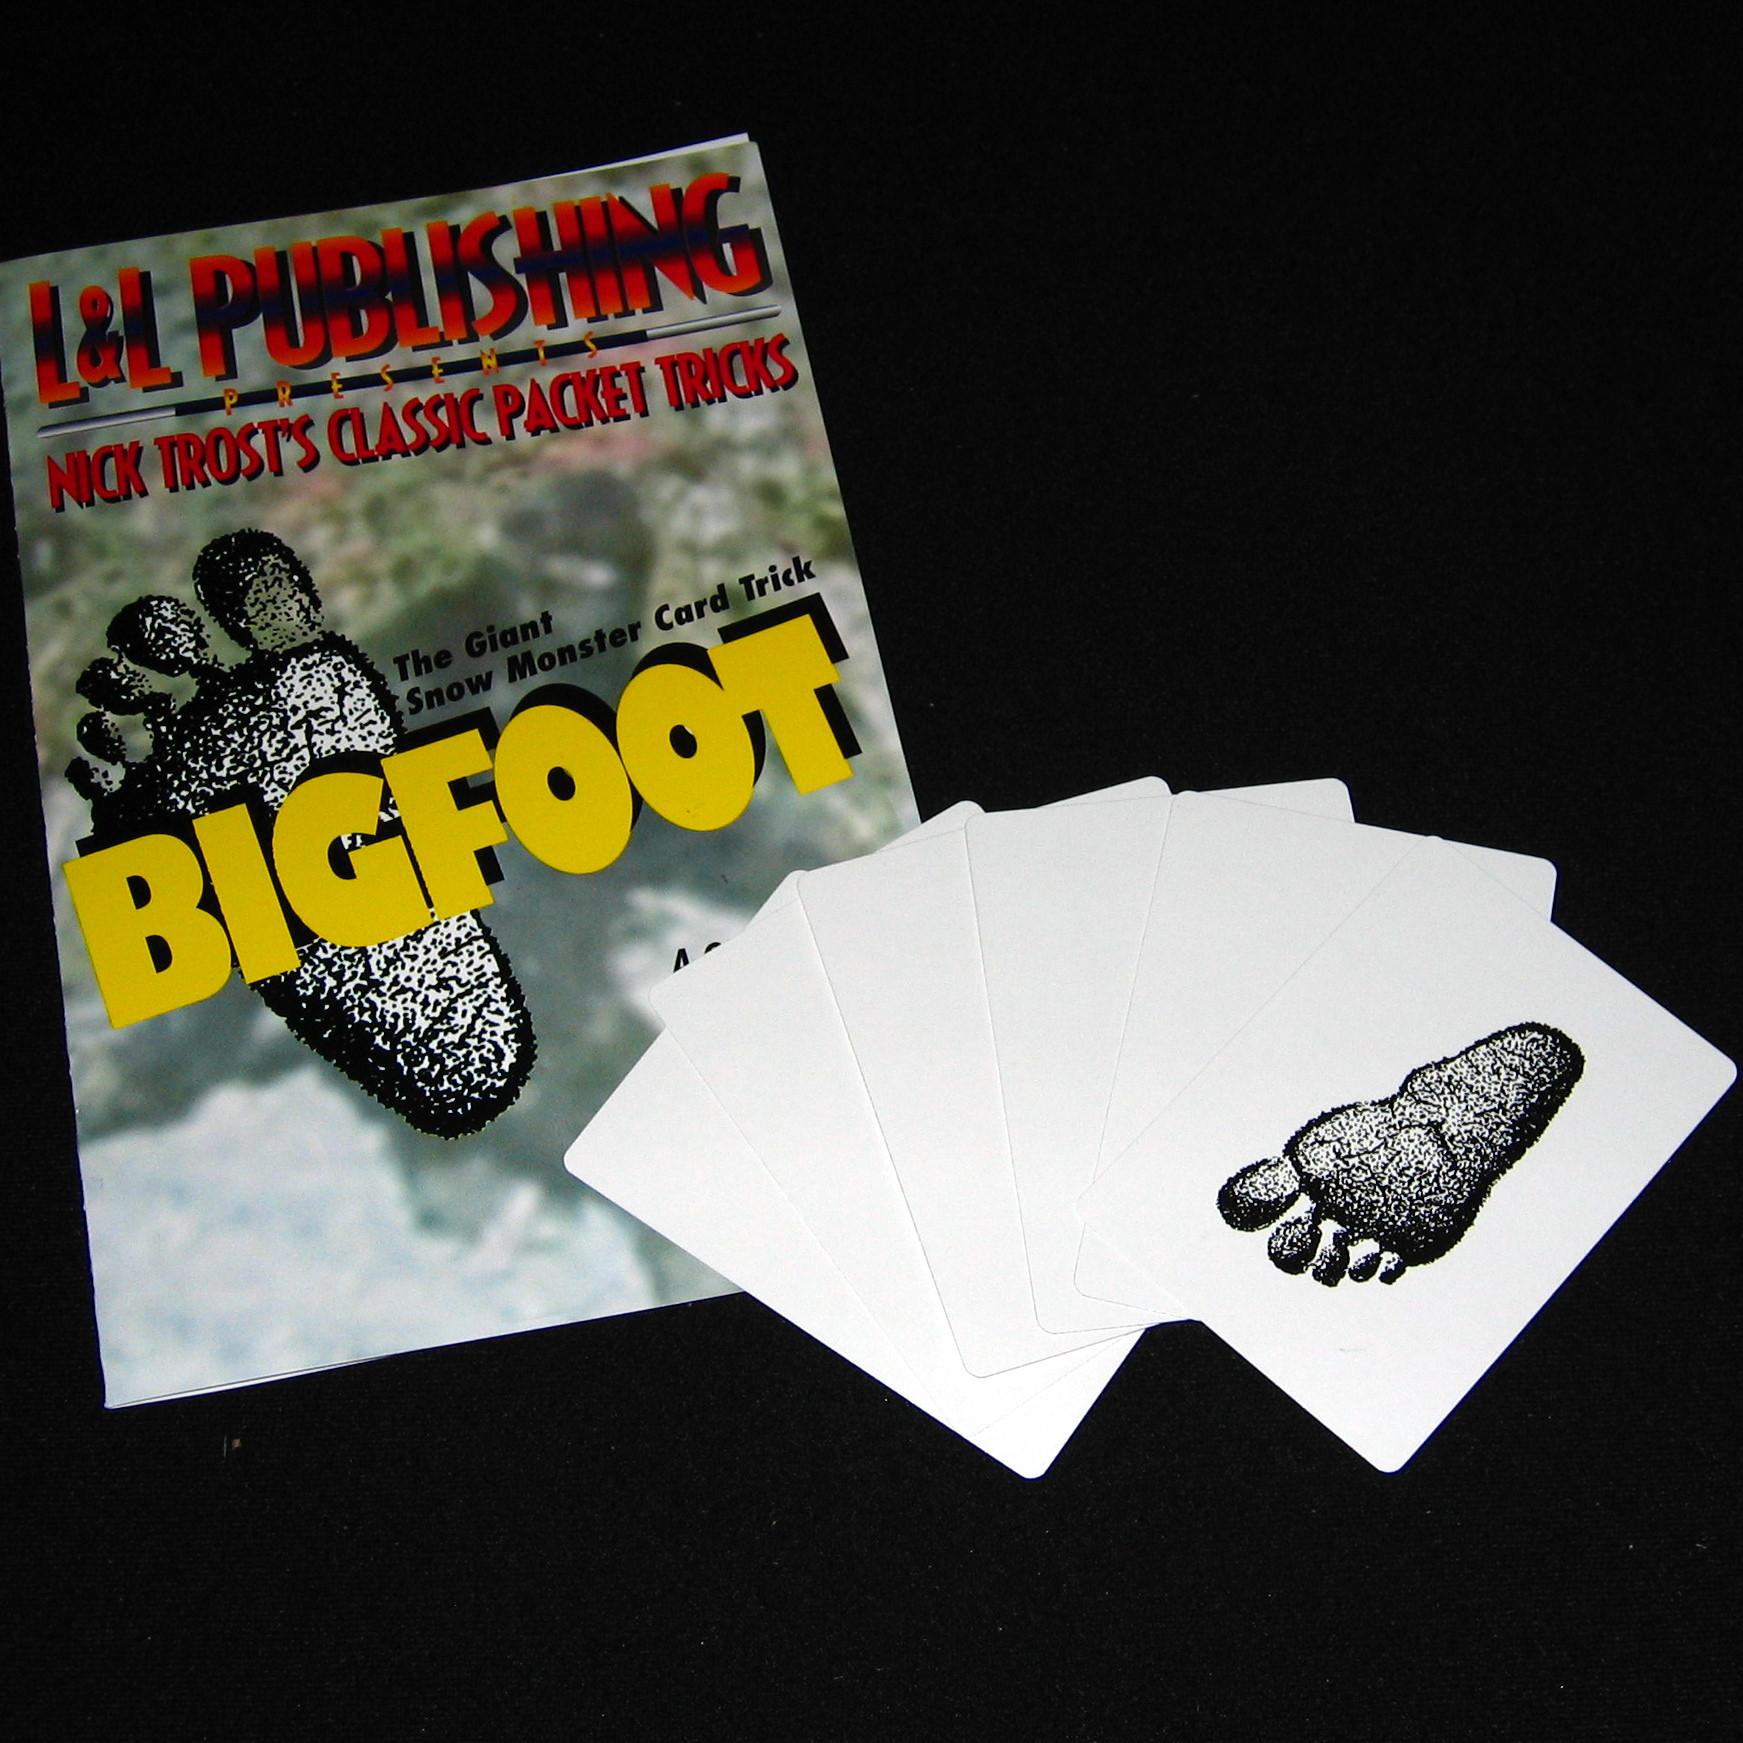 Bigfoot by Nick Trost